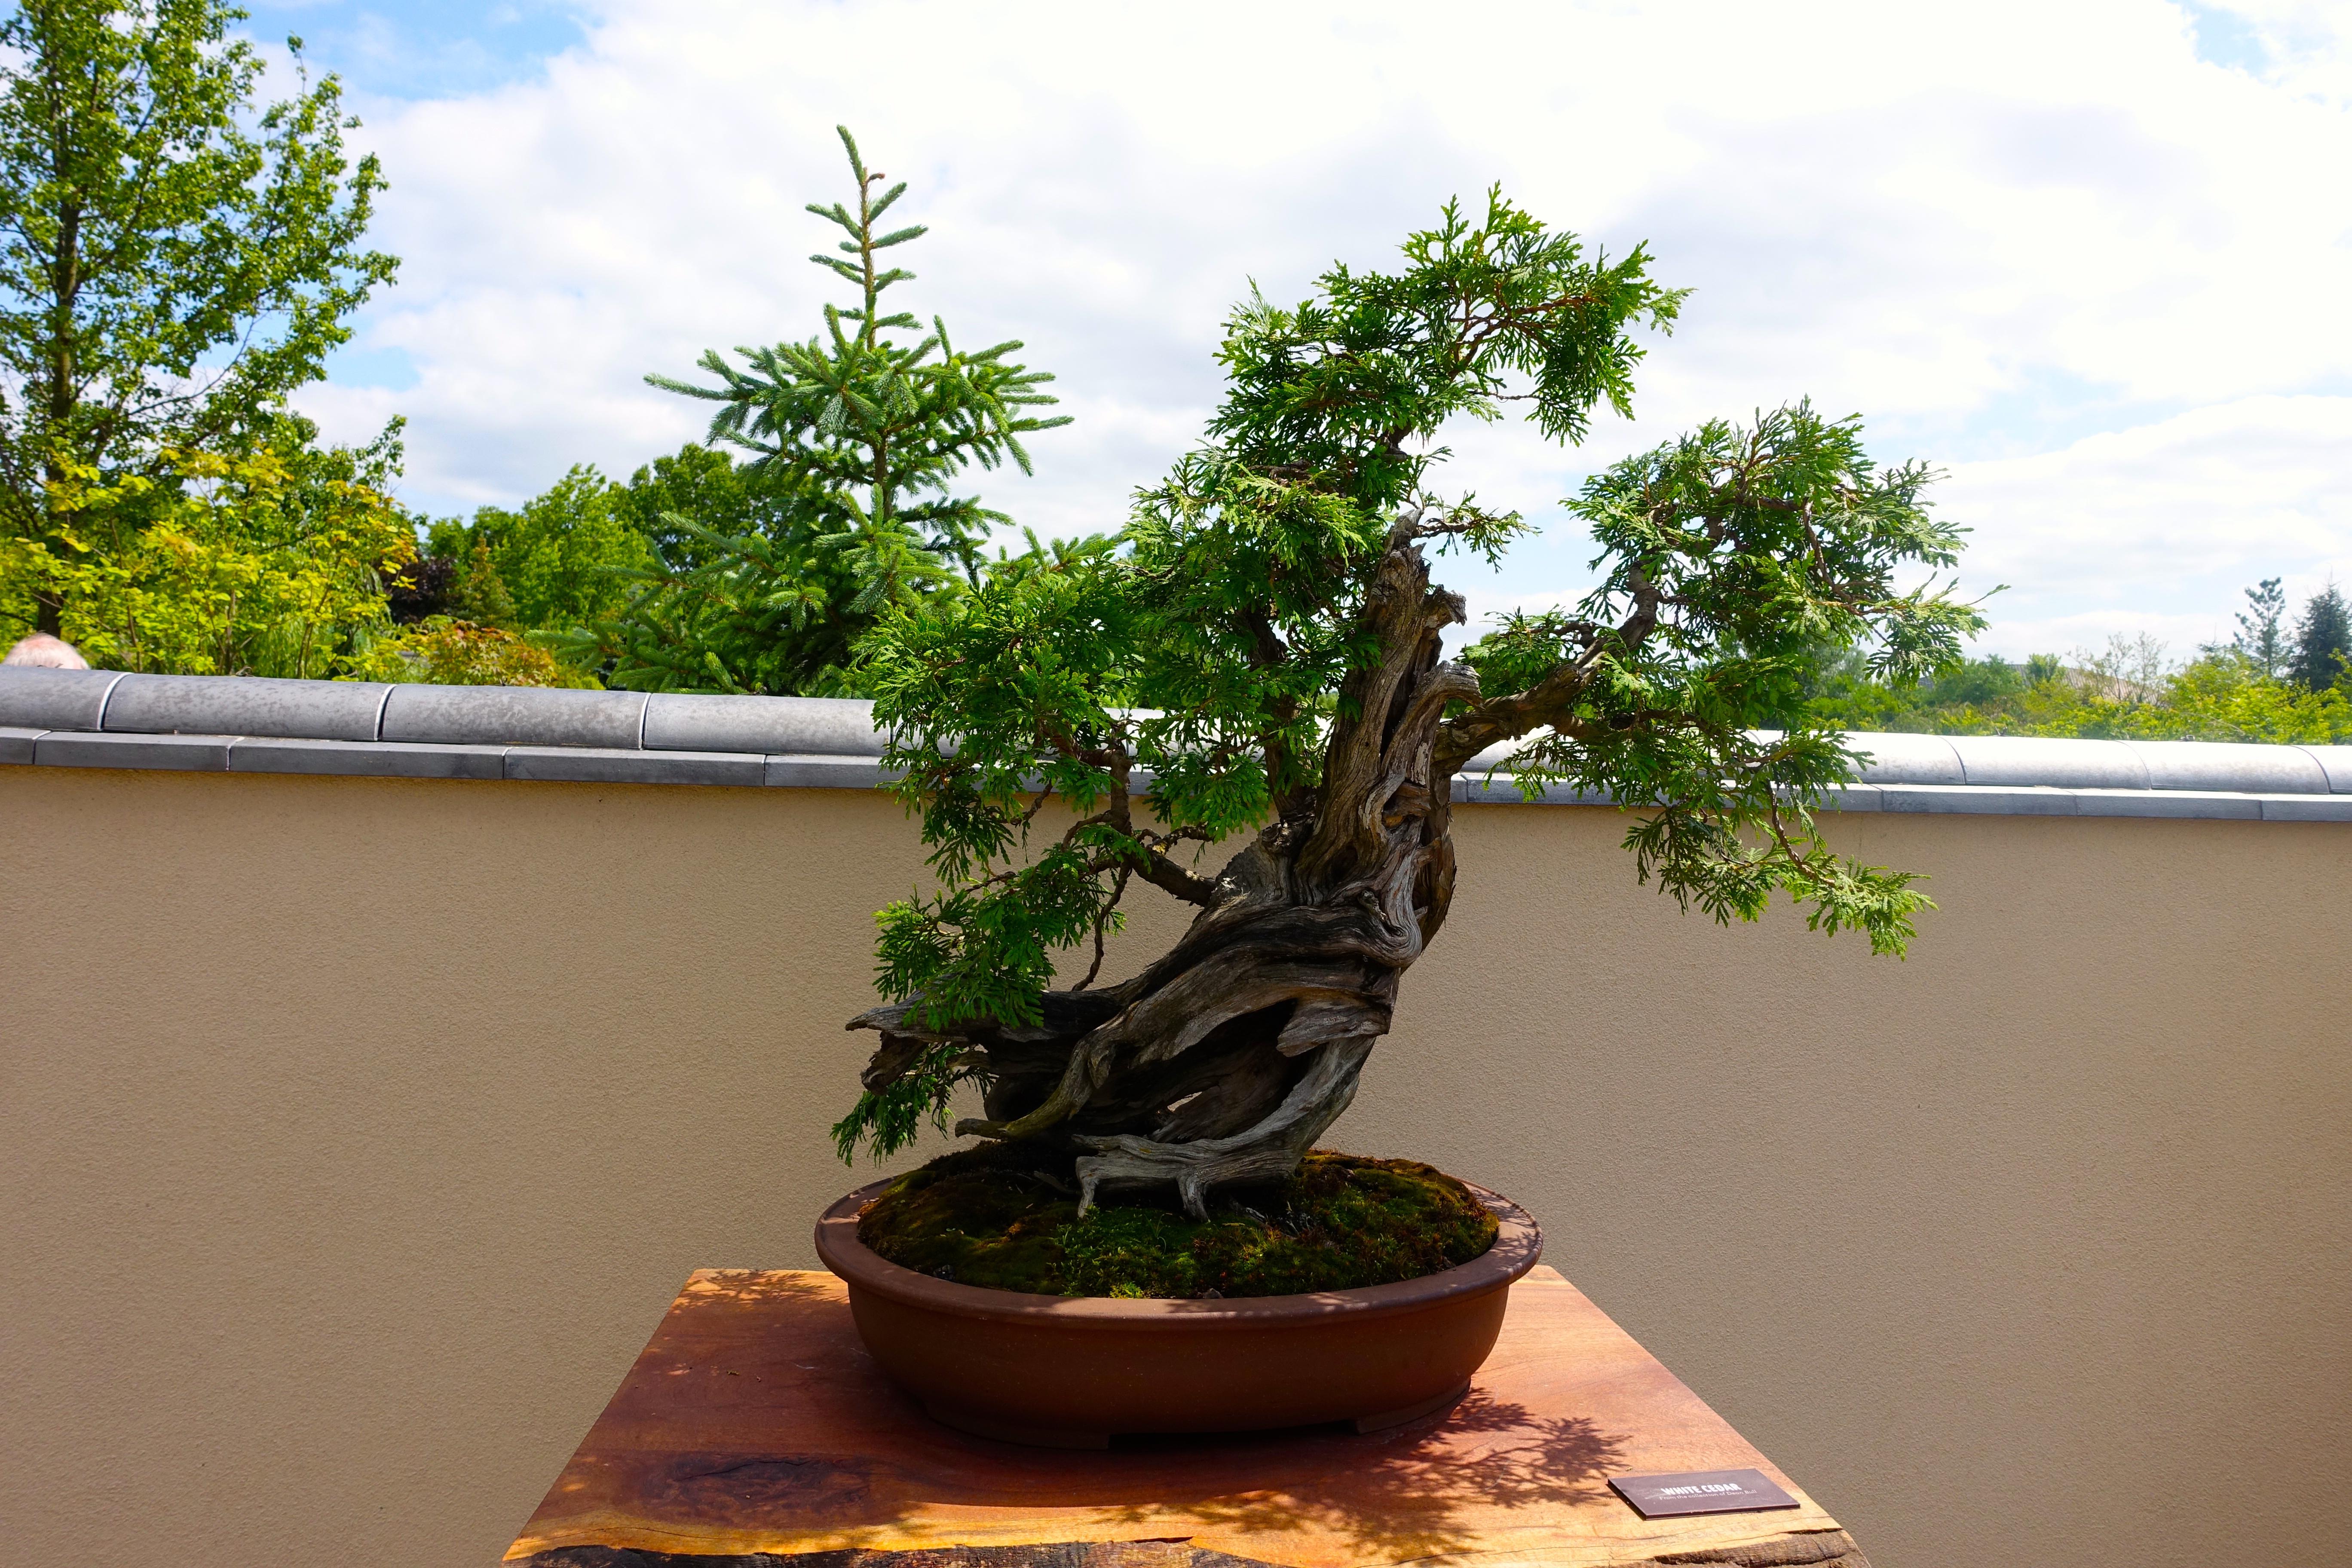 Bonsai at Frederik Meijer Japanese Garden